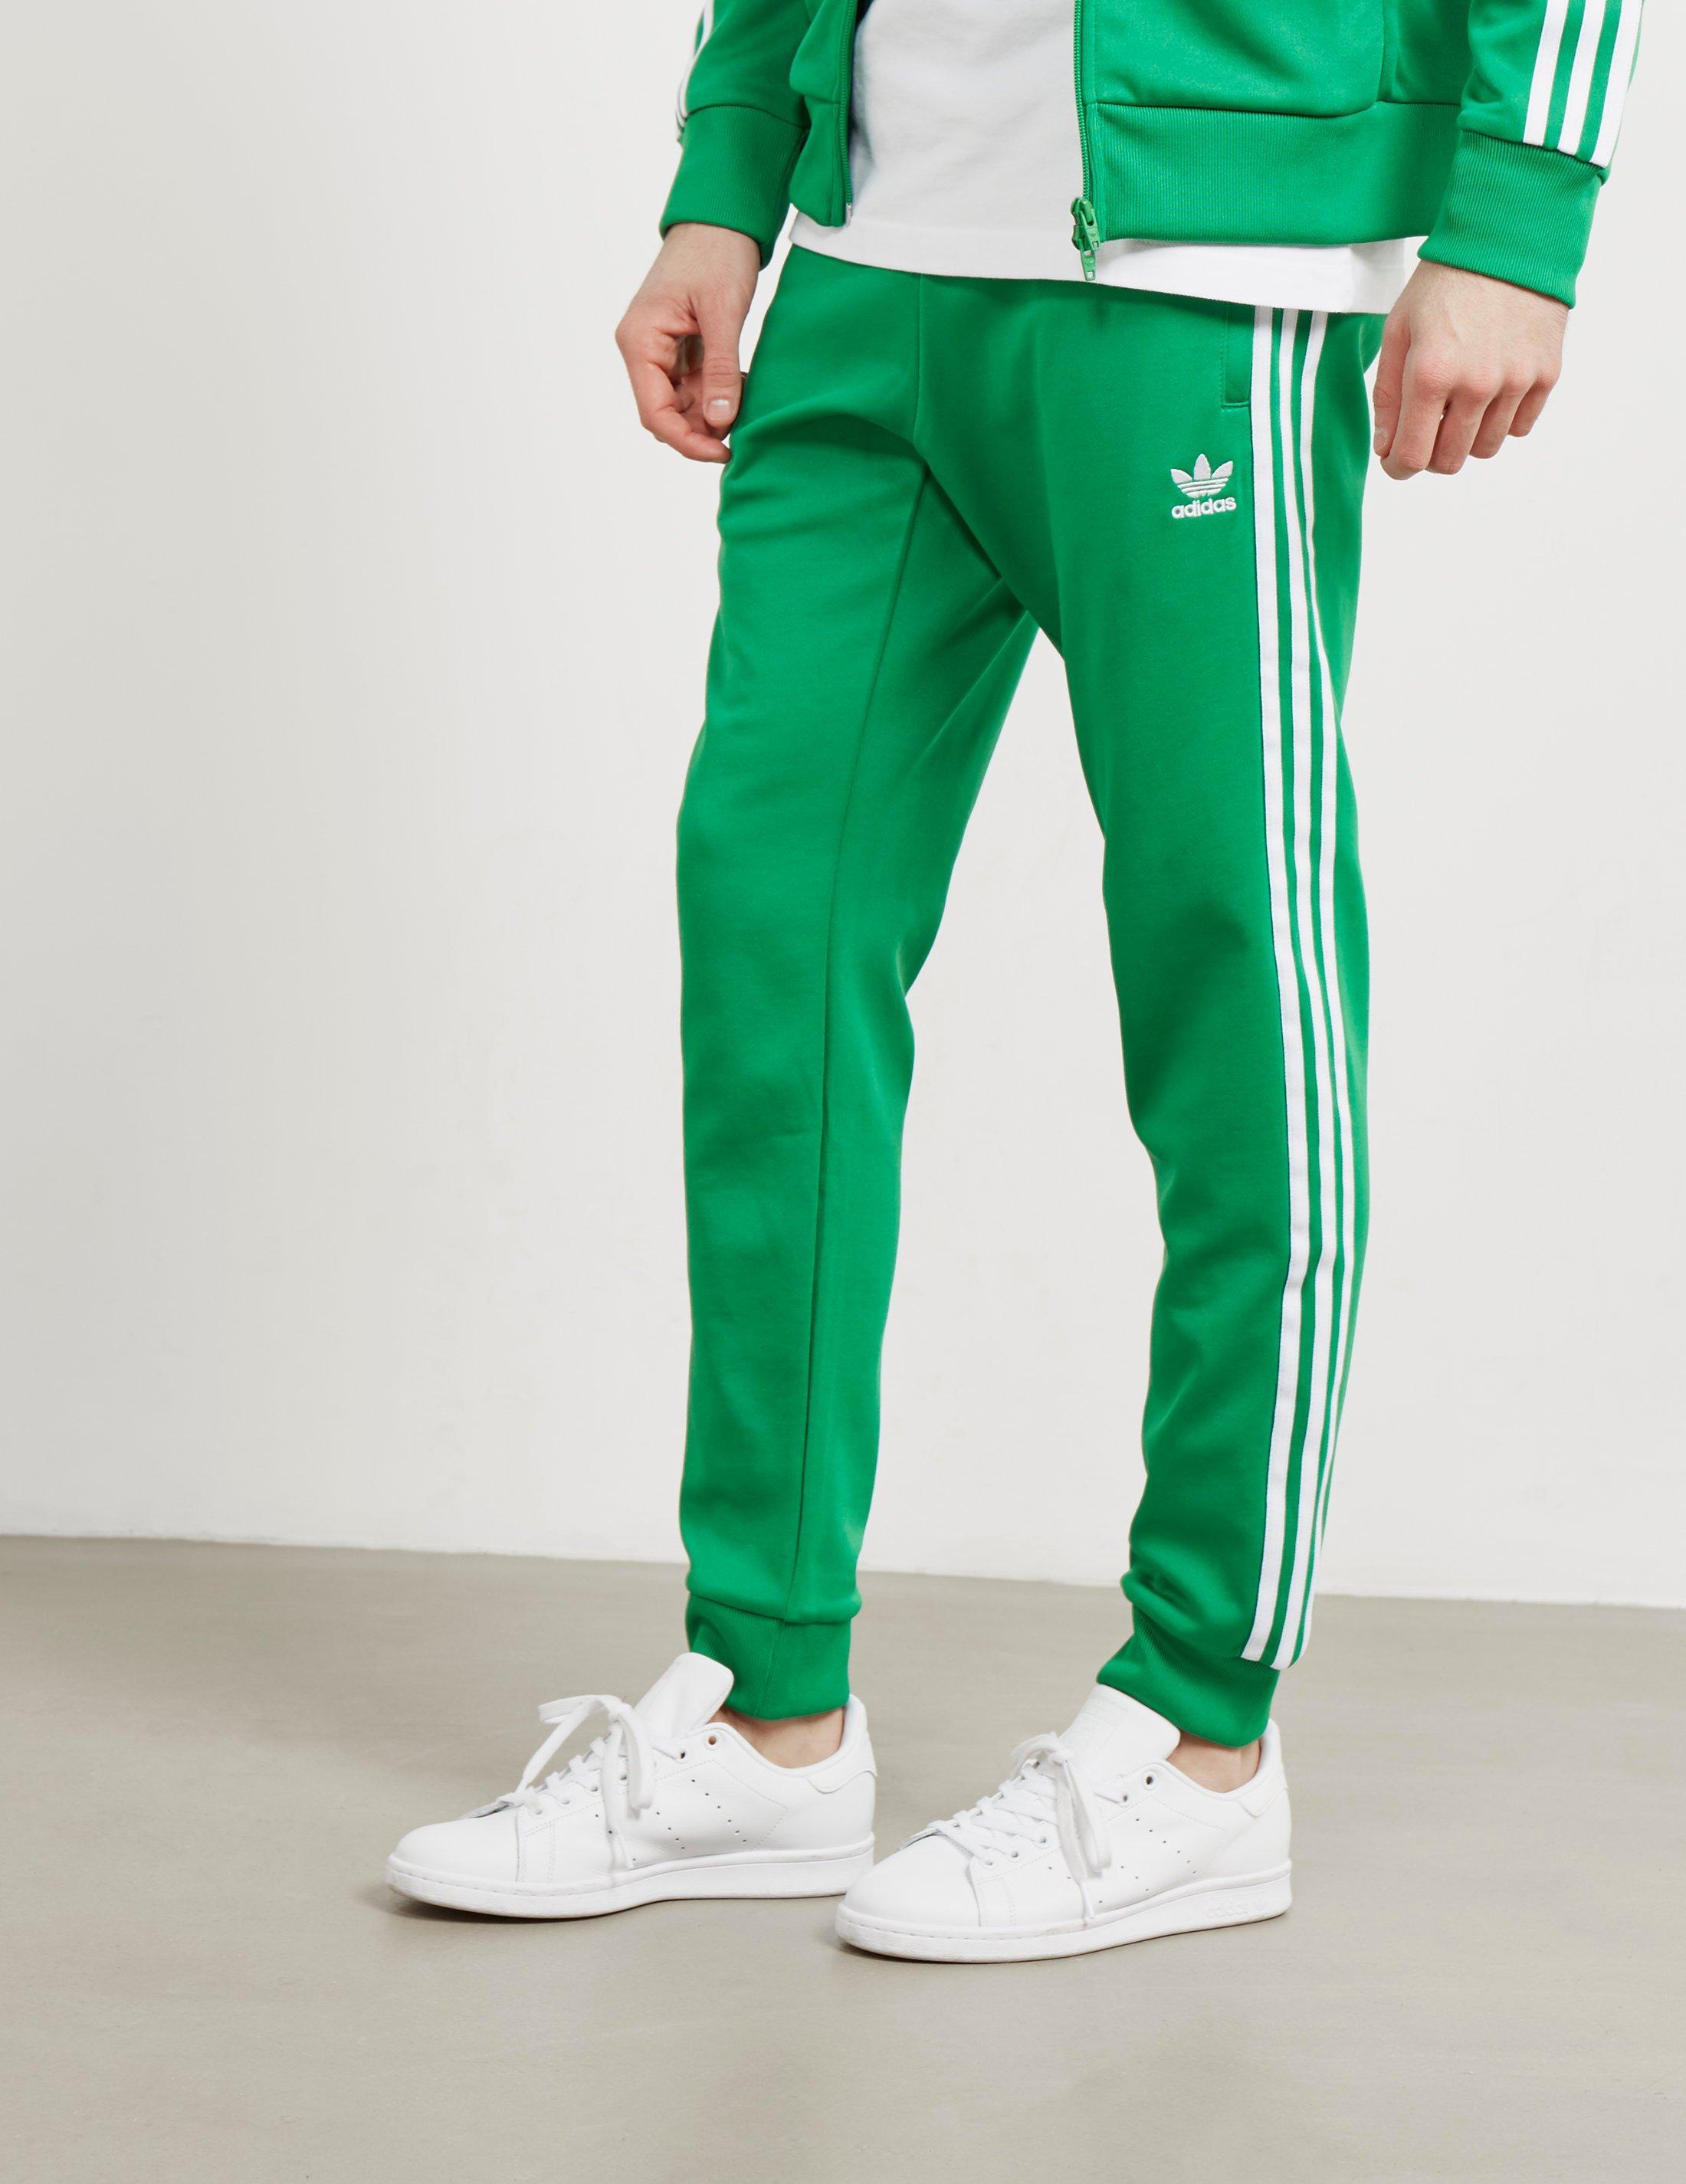 premium selection e9985 56ceb adidas Originals Mens Superstar Track Pants Green in Green for Men ...